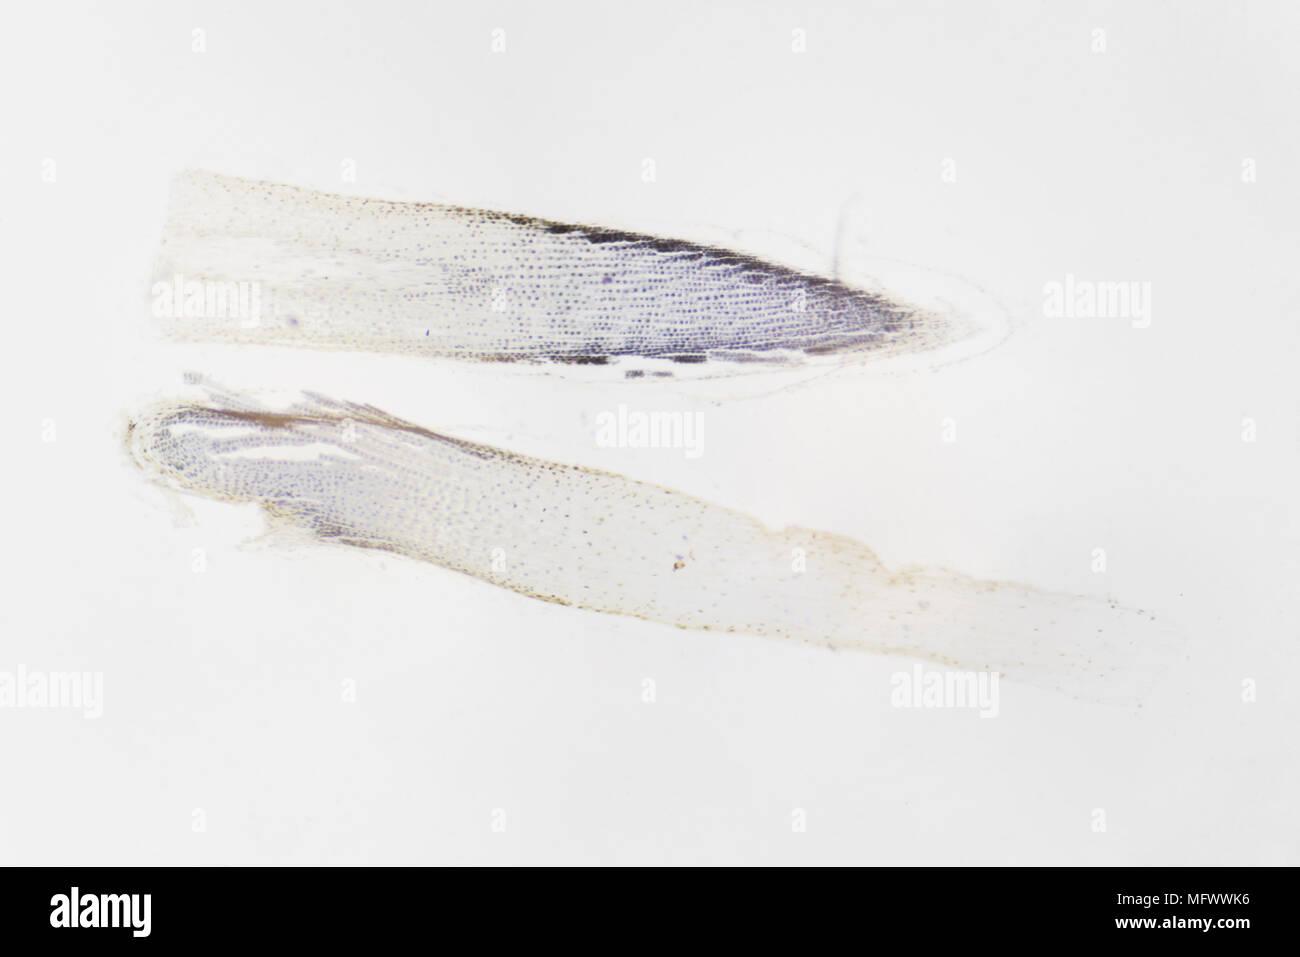 Microscopic photography. Root of allium cepa, transversal section. - Stock Image